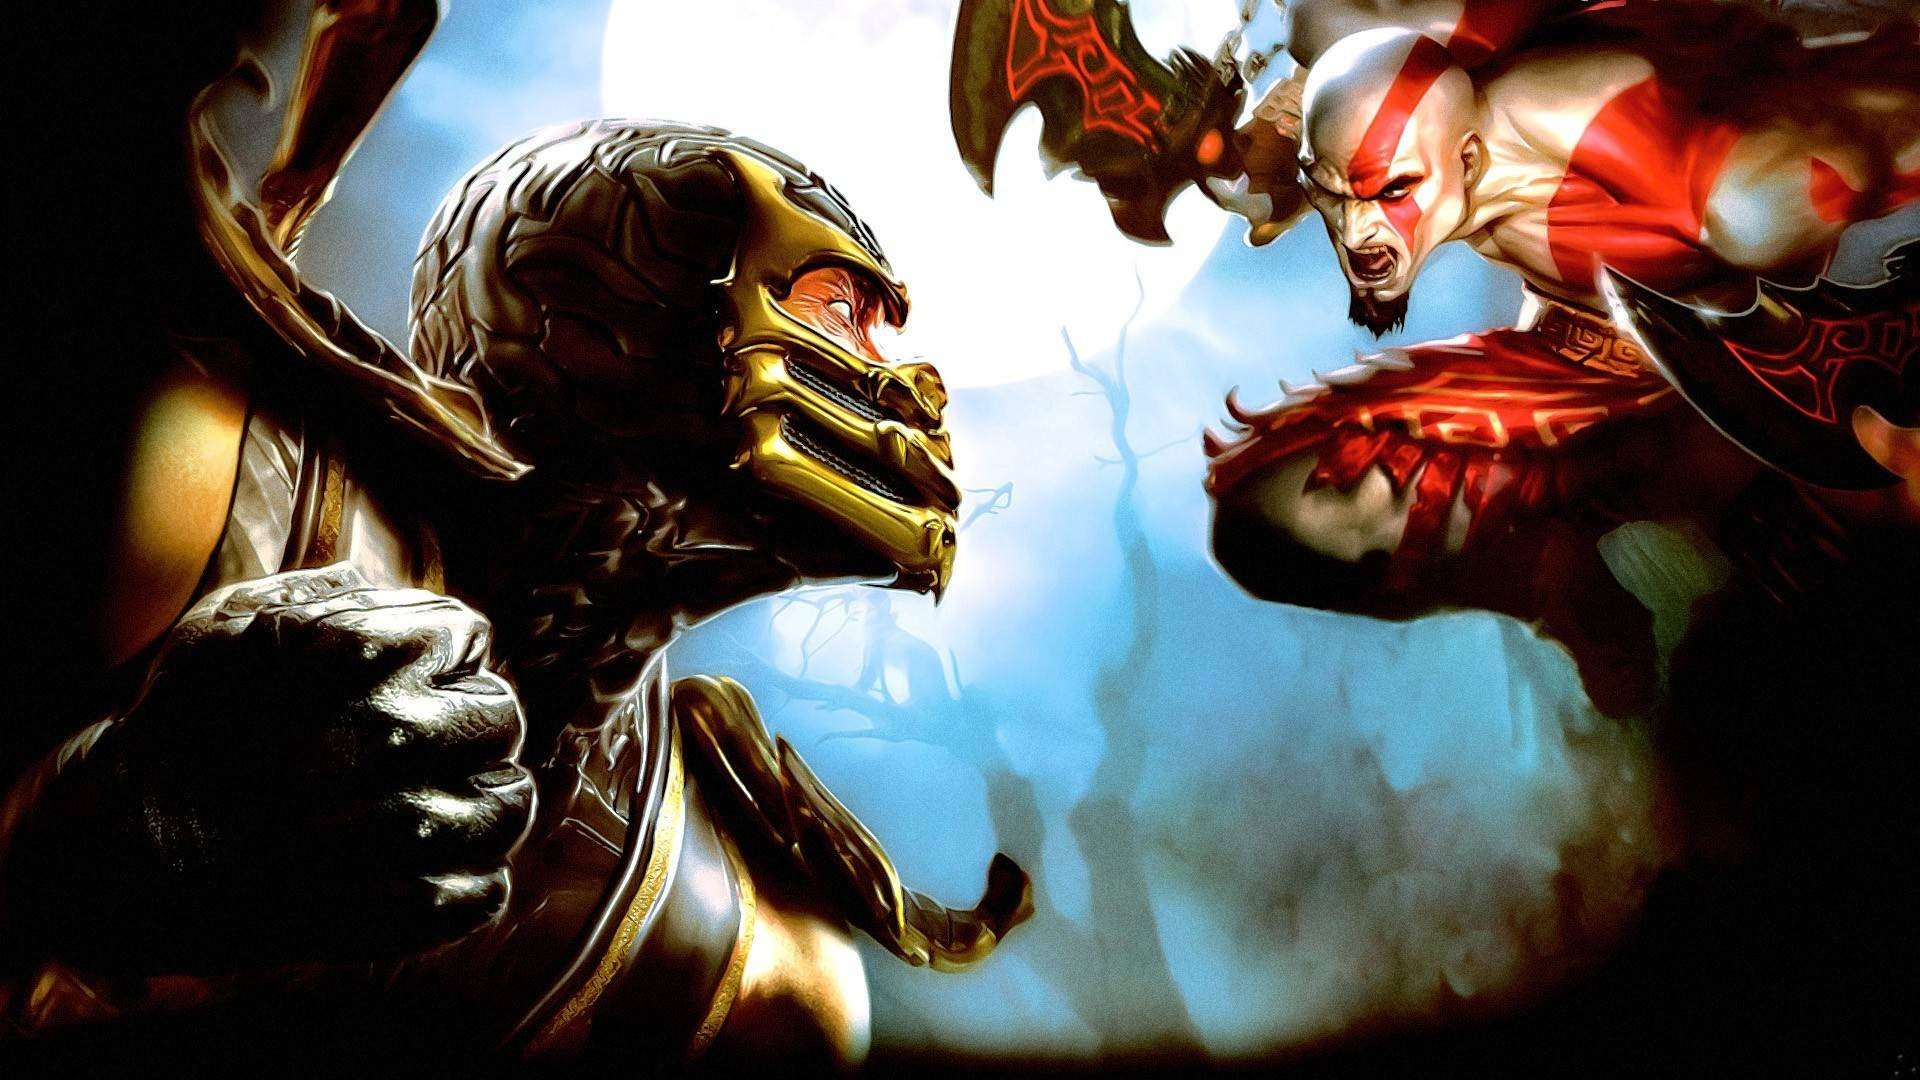 God Of War Wallpaper 1080p